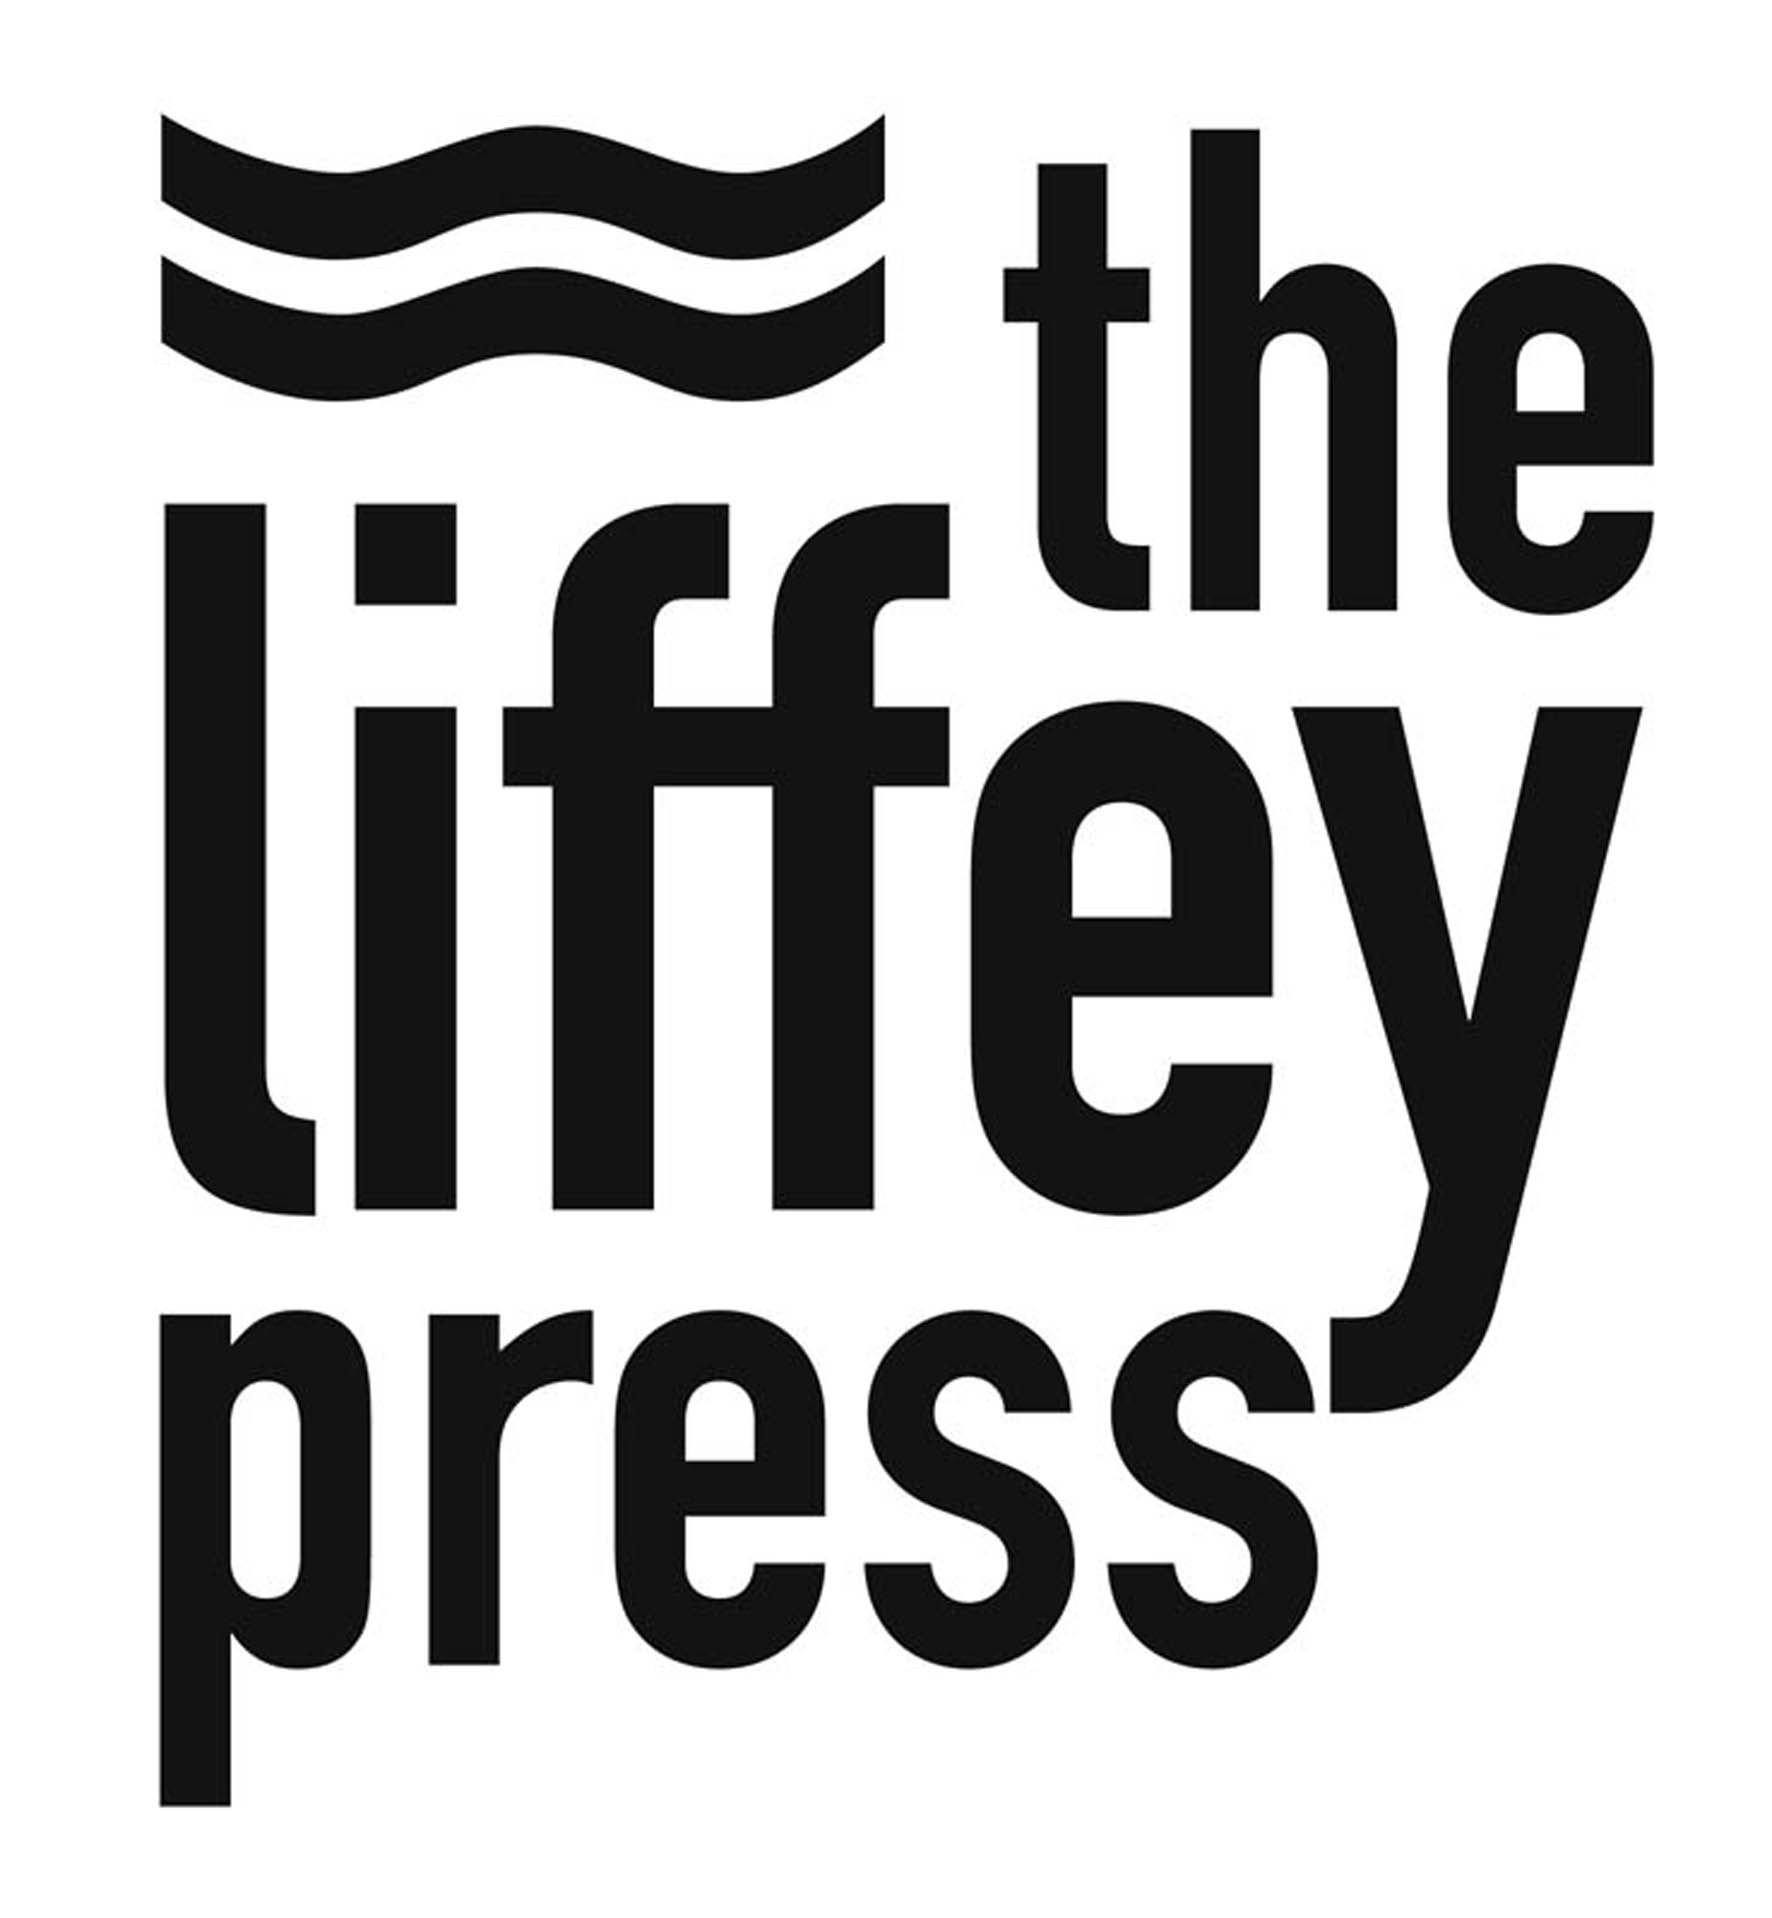 Liffey Press